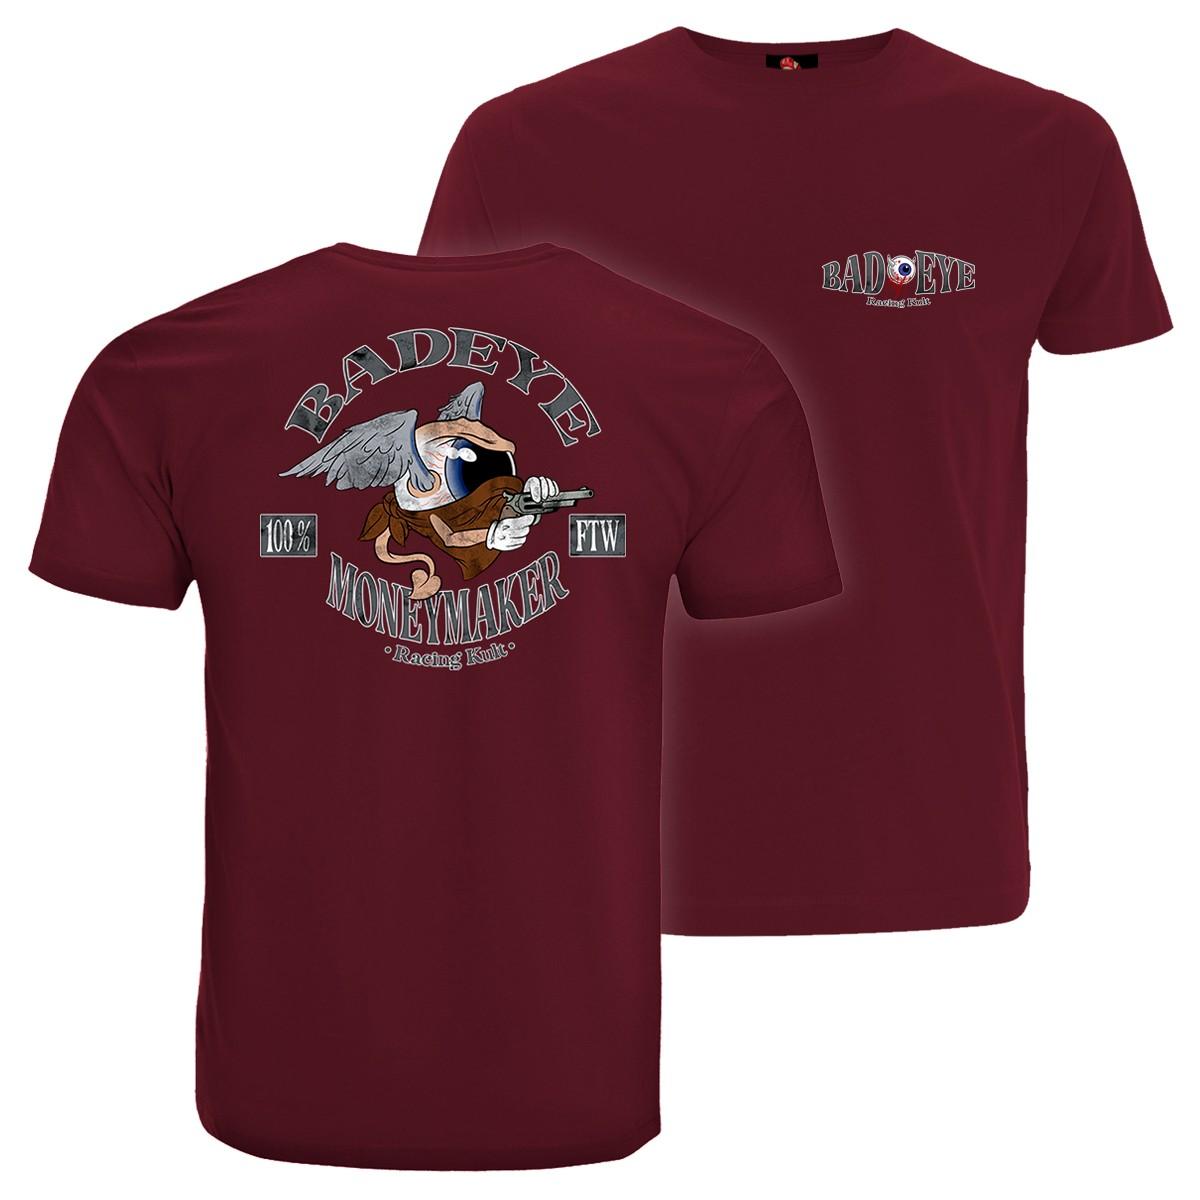 Racing Kult T-Shirt Moneymaker